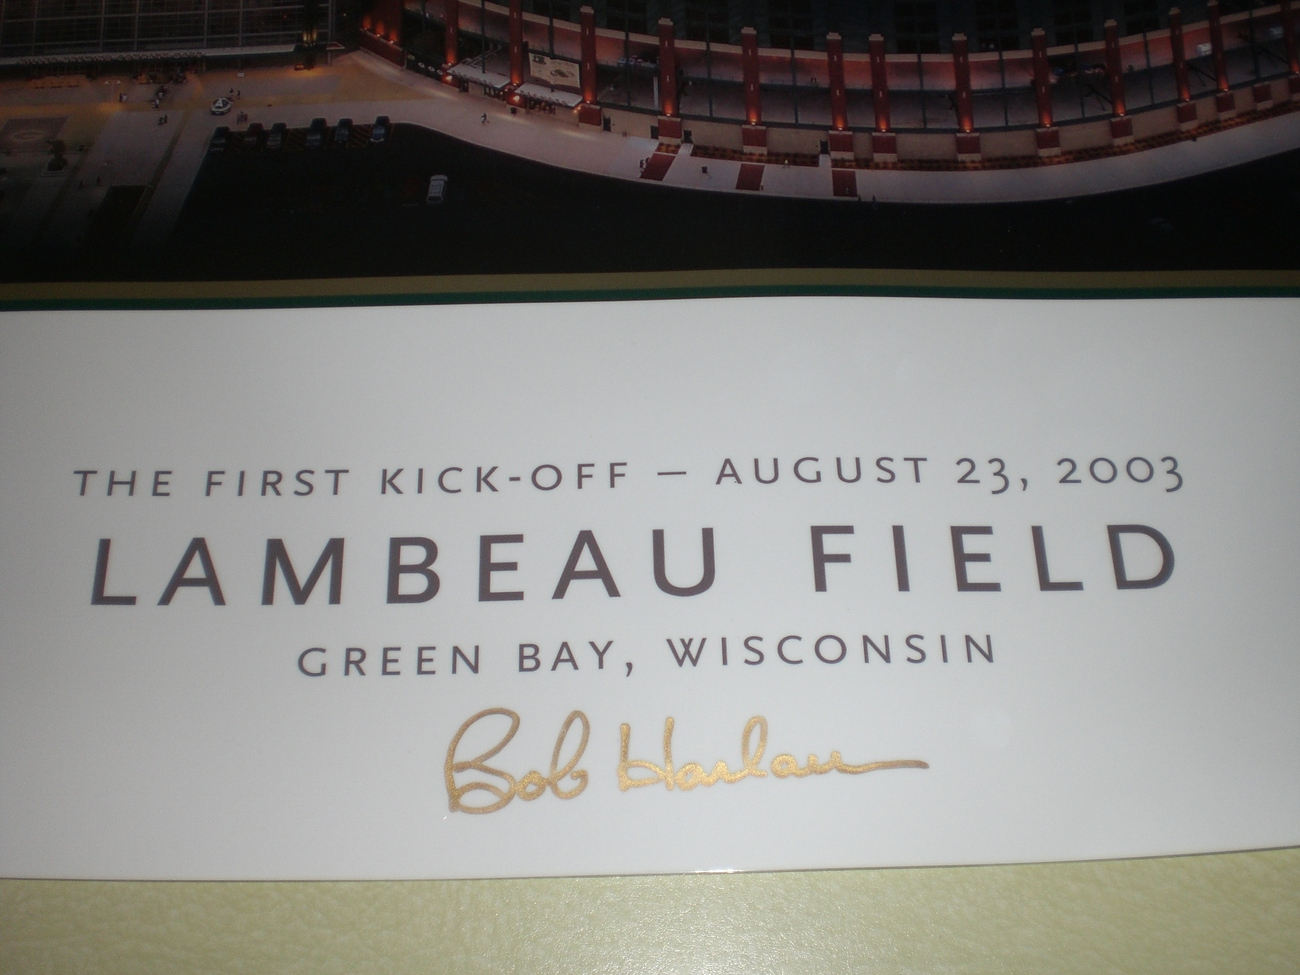 Brett Favre Autograph Green Bay Packers Lambeau Field print